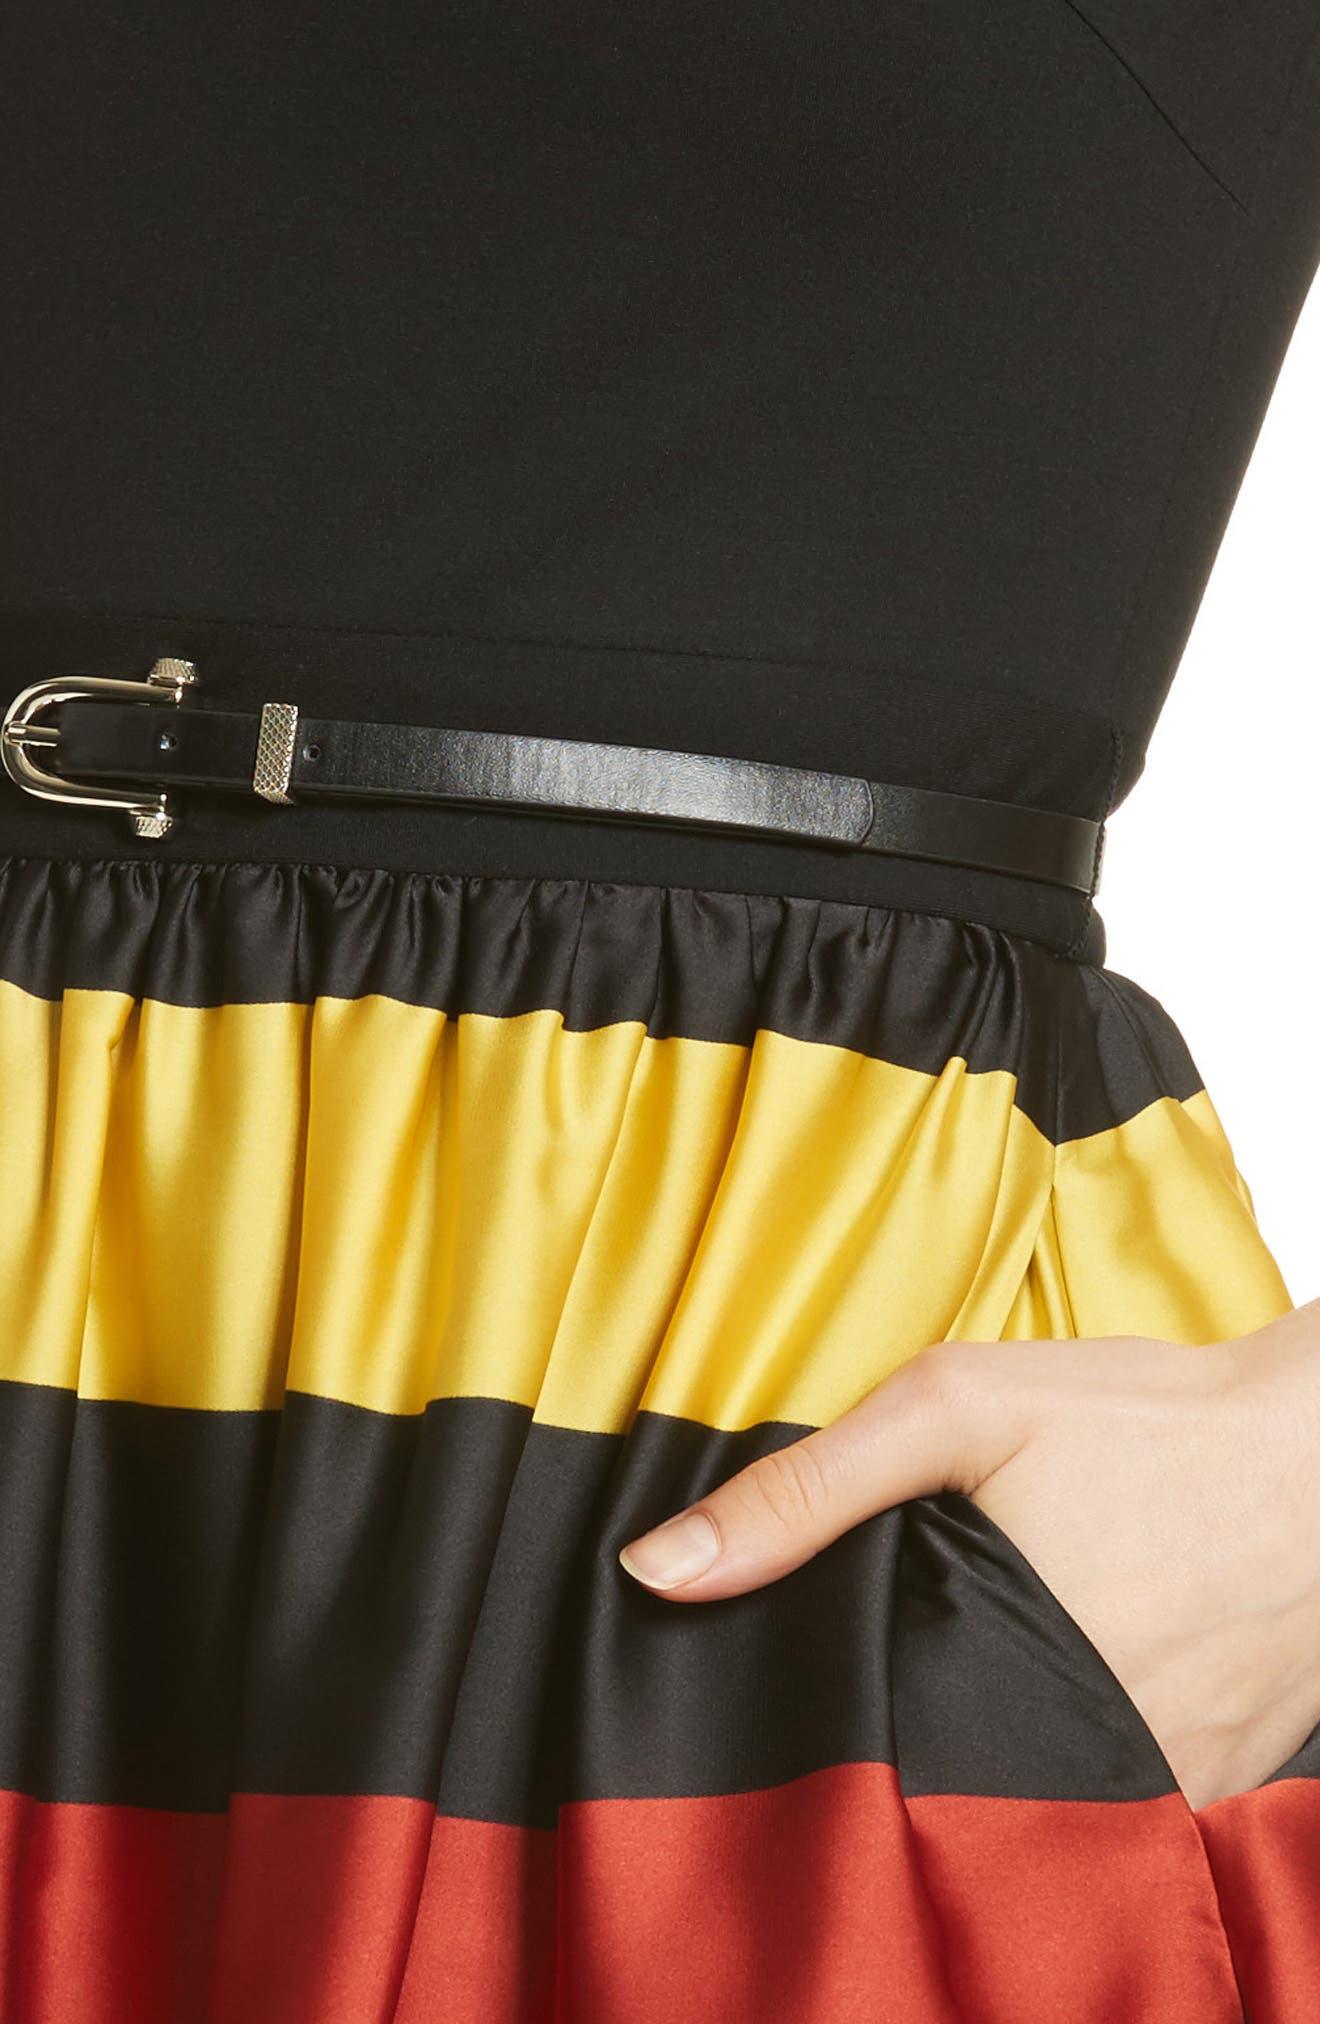 TED BAKER LONDON,                             Cruise Stripe Fit & Flare Dress,                             Alternate thumbnail 4, color,                             001